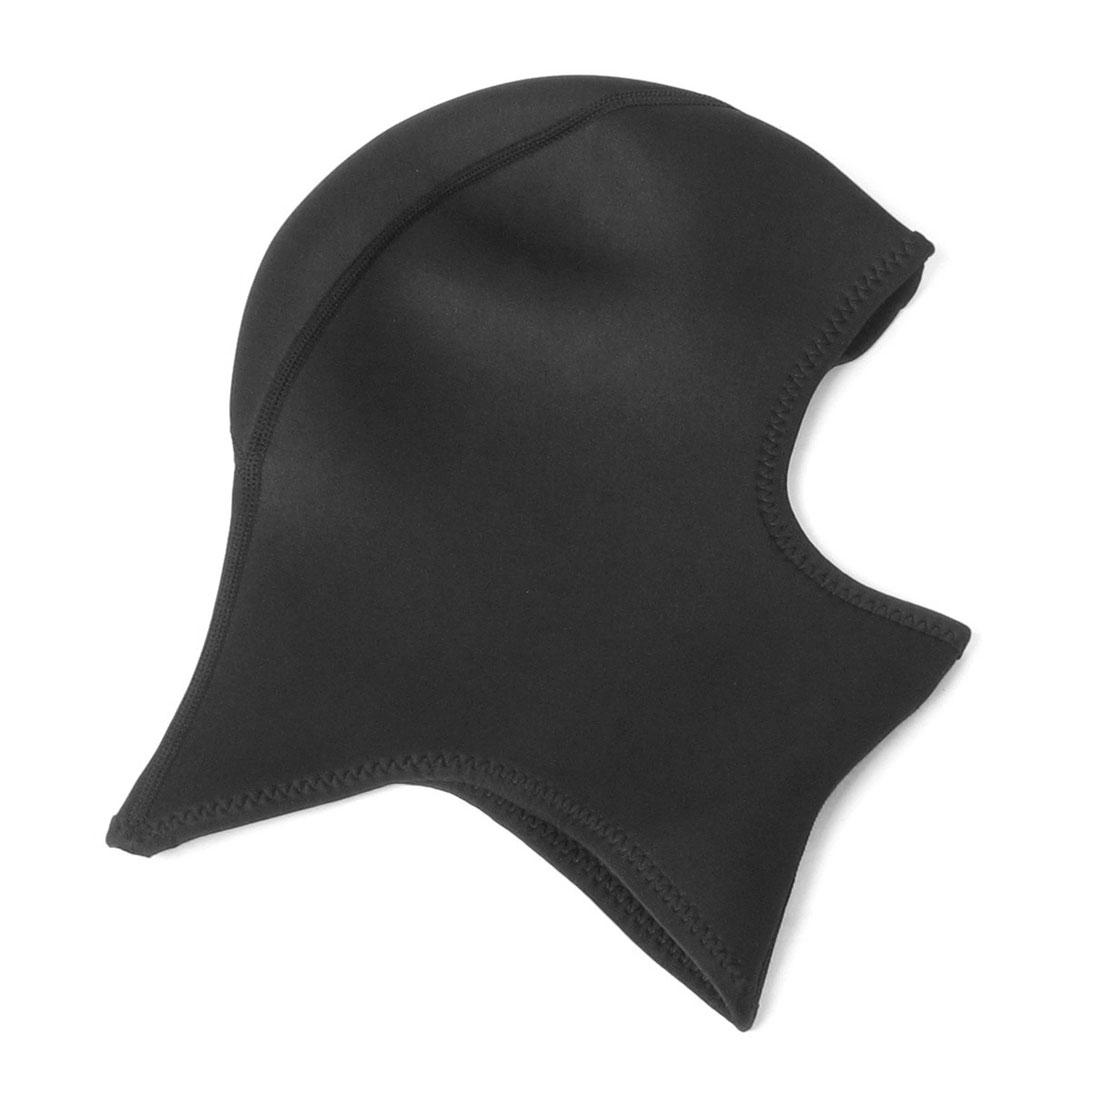 Motorbike Biker Black Stretchy Helmet Support Head Neck Mask Thin Balaclava L